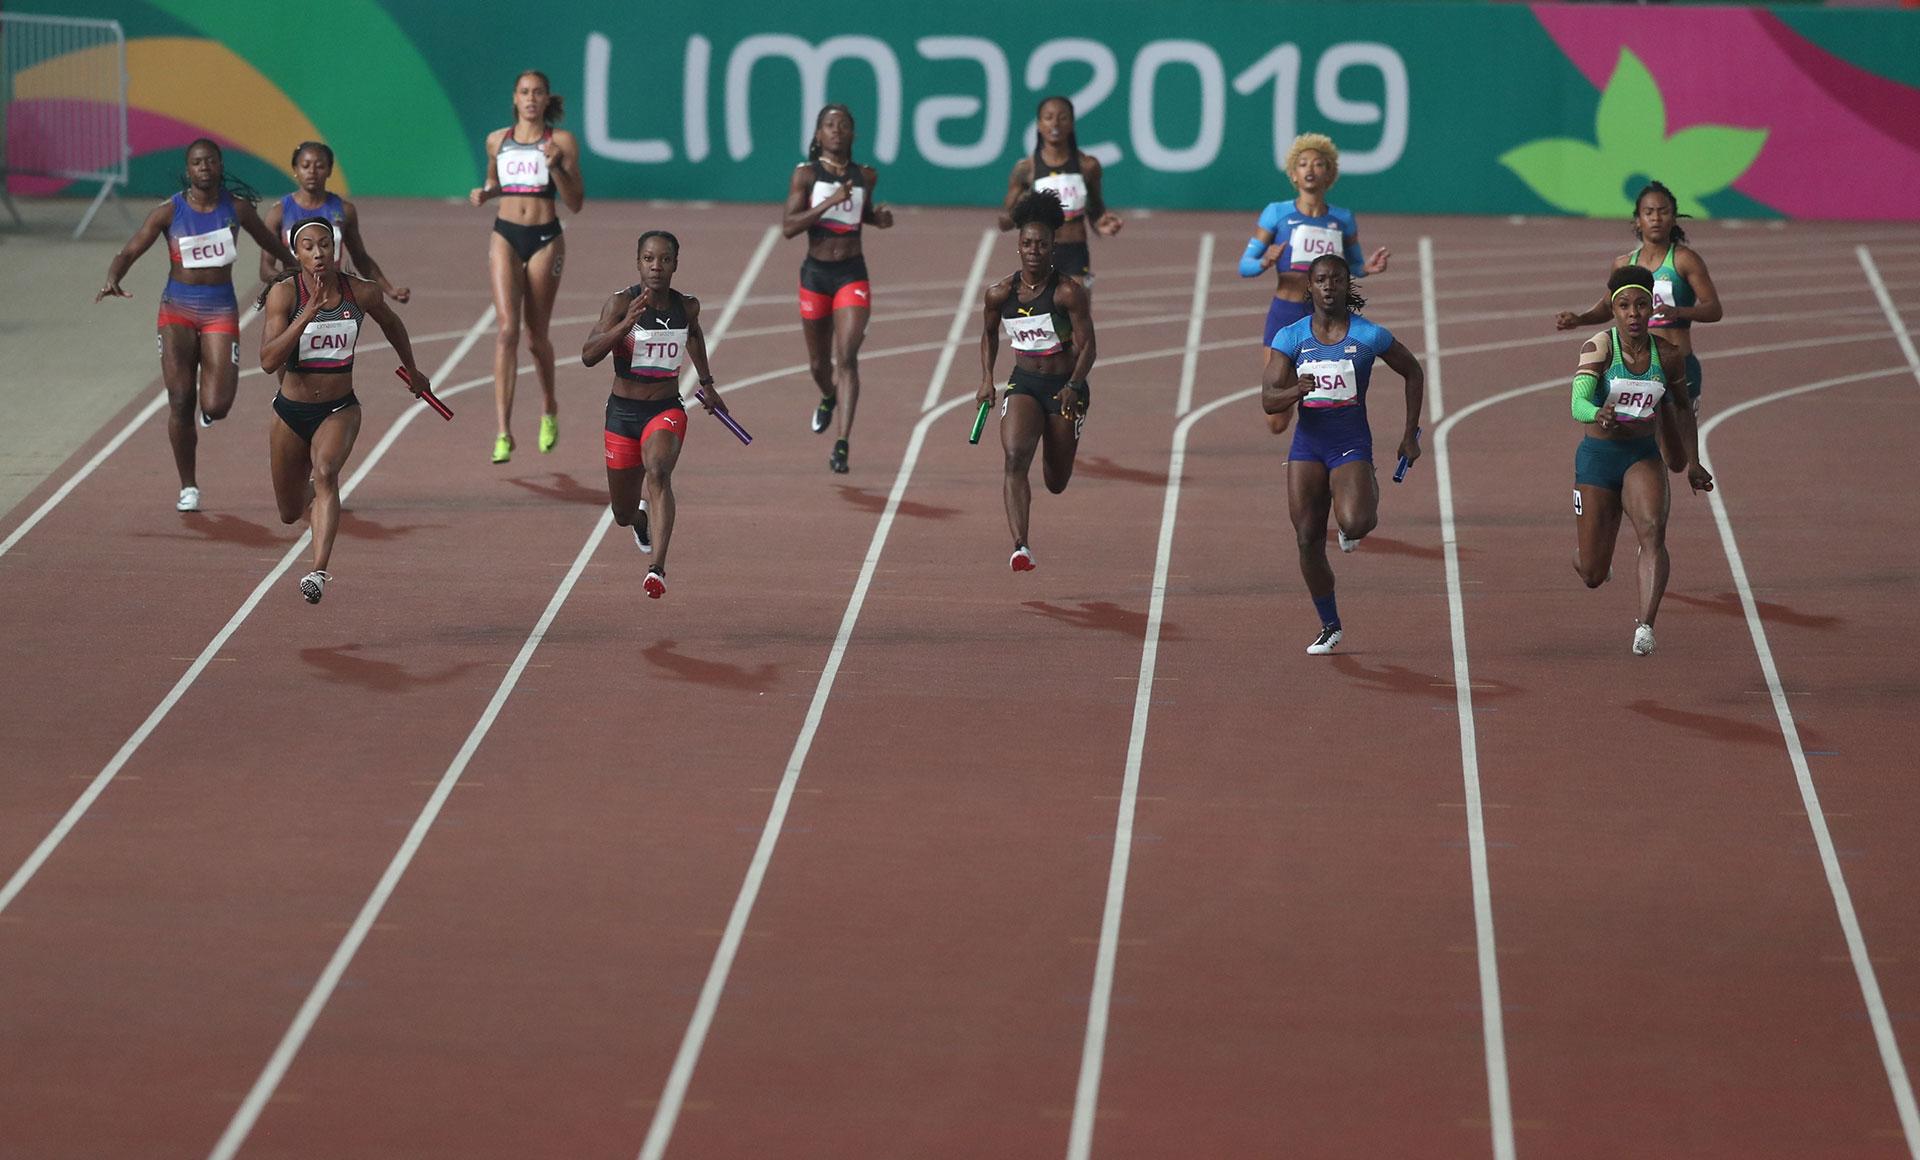 XVIII Pan American Games - Lima 2019 - Athletics - Women's 4x100m Relay Final - Athletics Stadium, Lima, Peru - August 9, 2019. Athletes in action. REUTERS/Ivan Alvarado